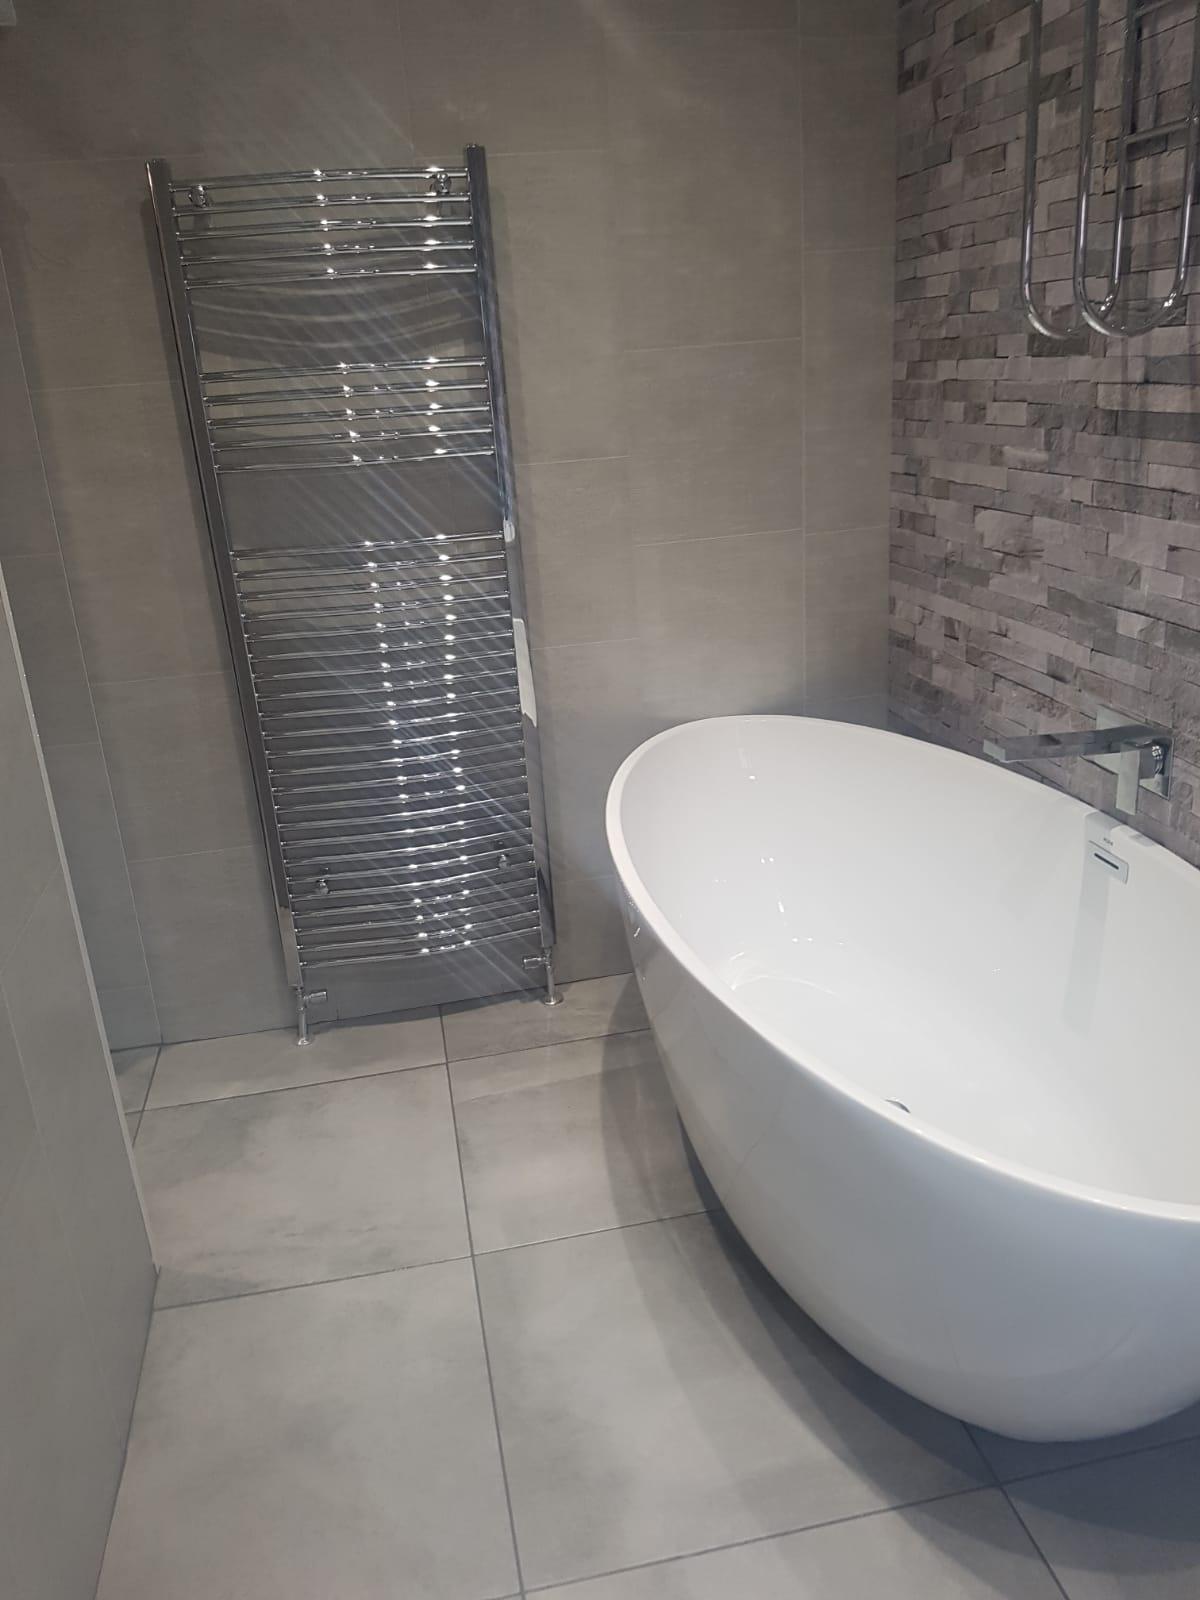 Bath and towel radiator